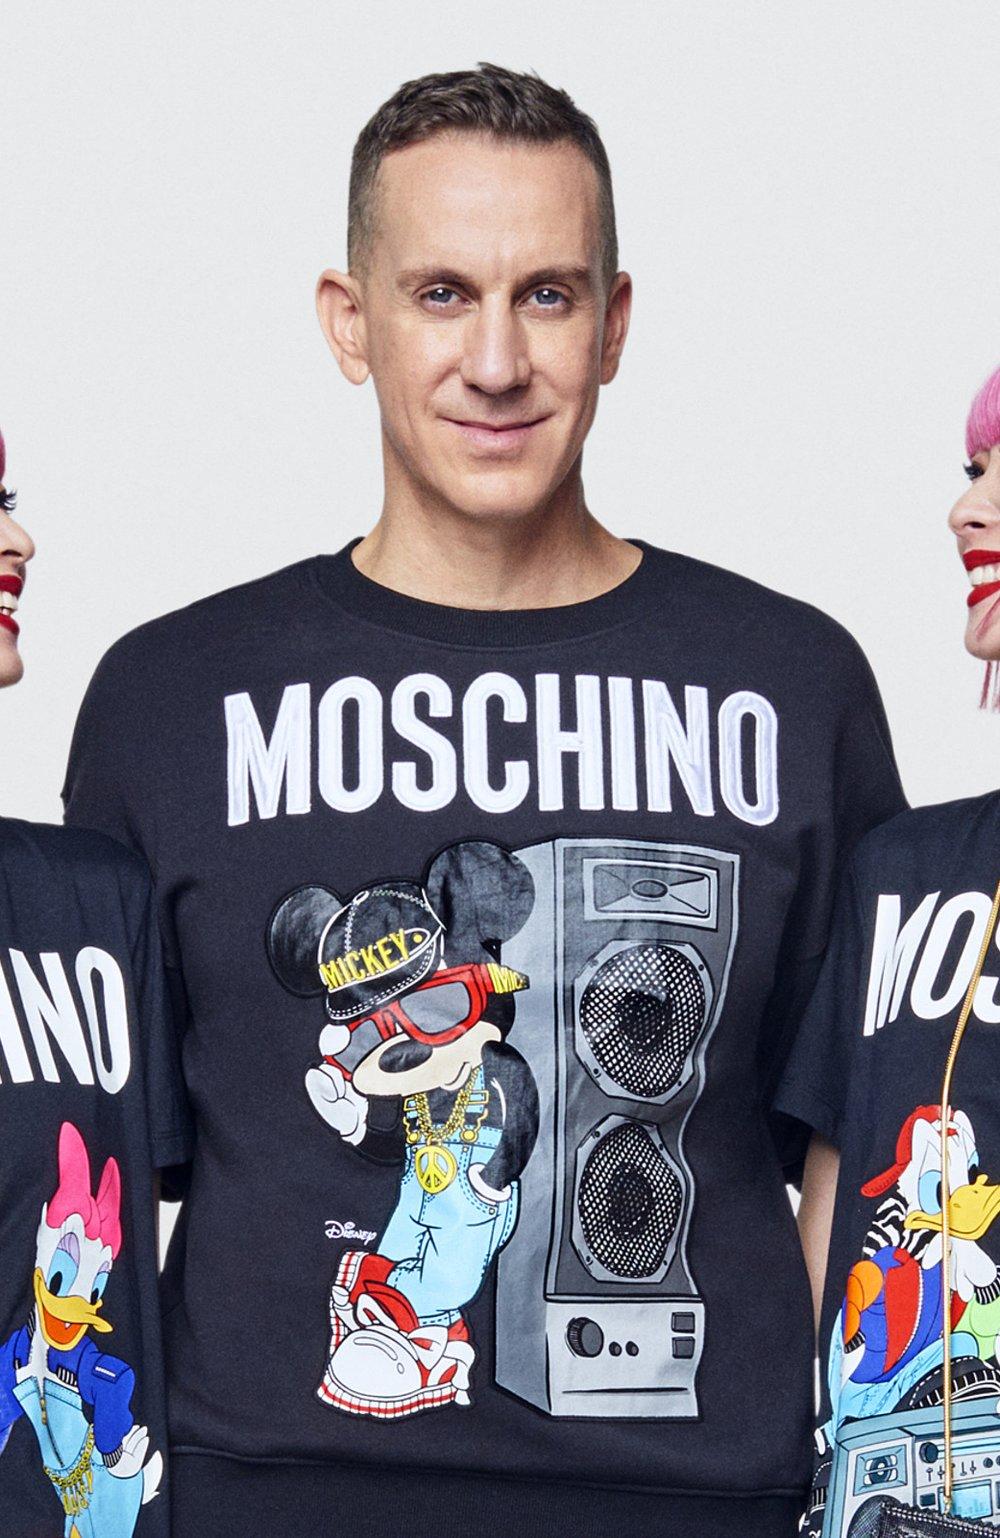 moschino-hm-kollaboration-lookbook-2018